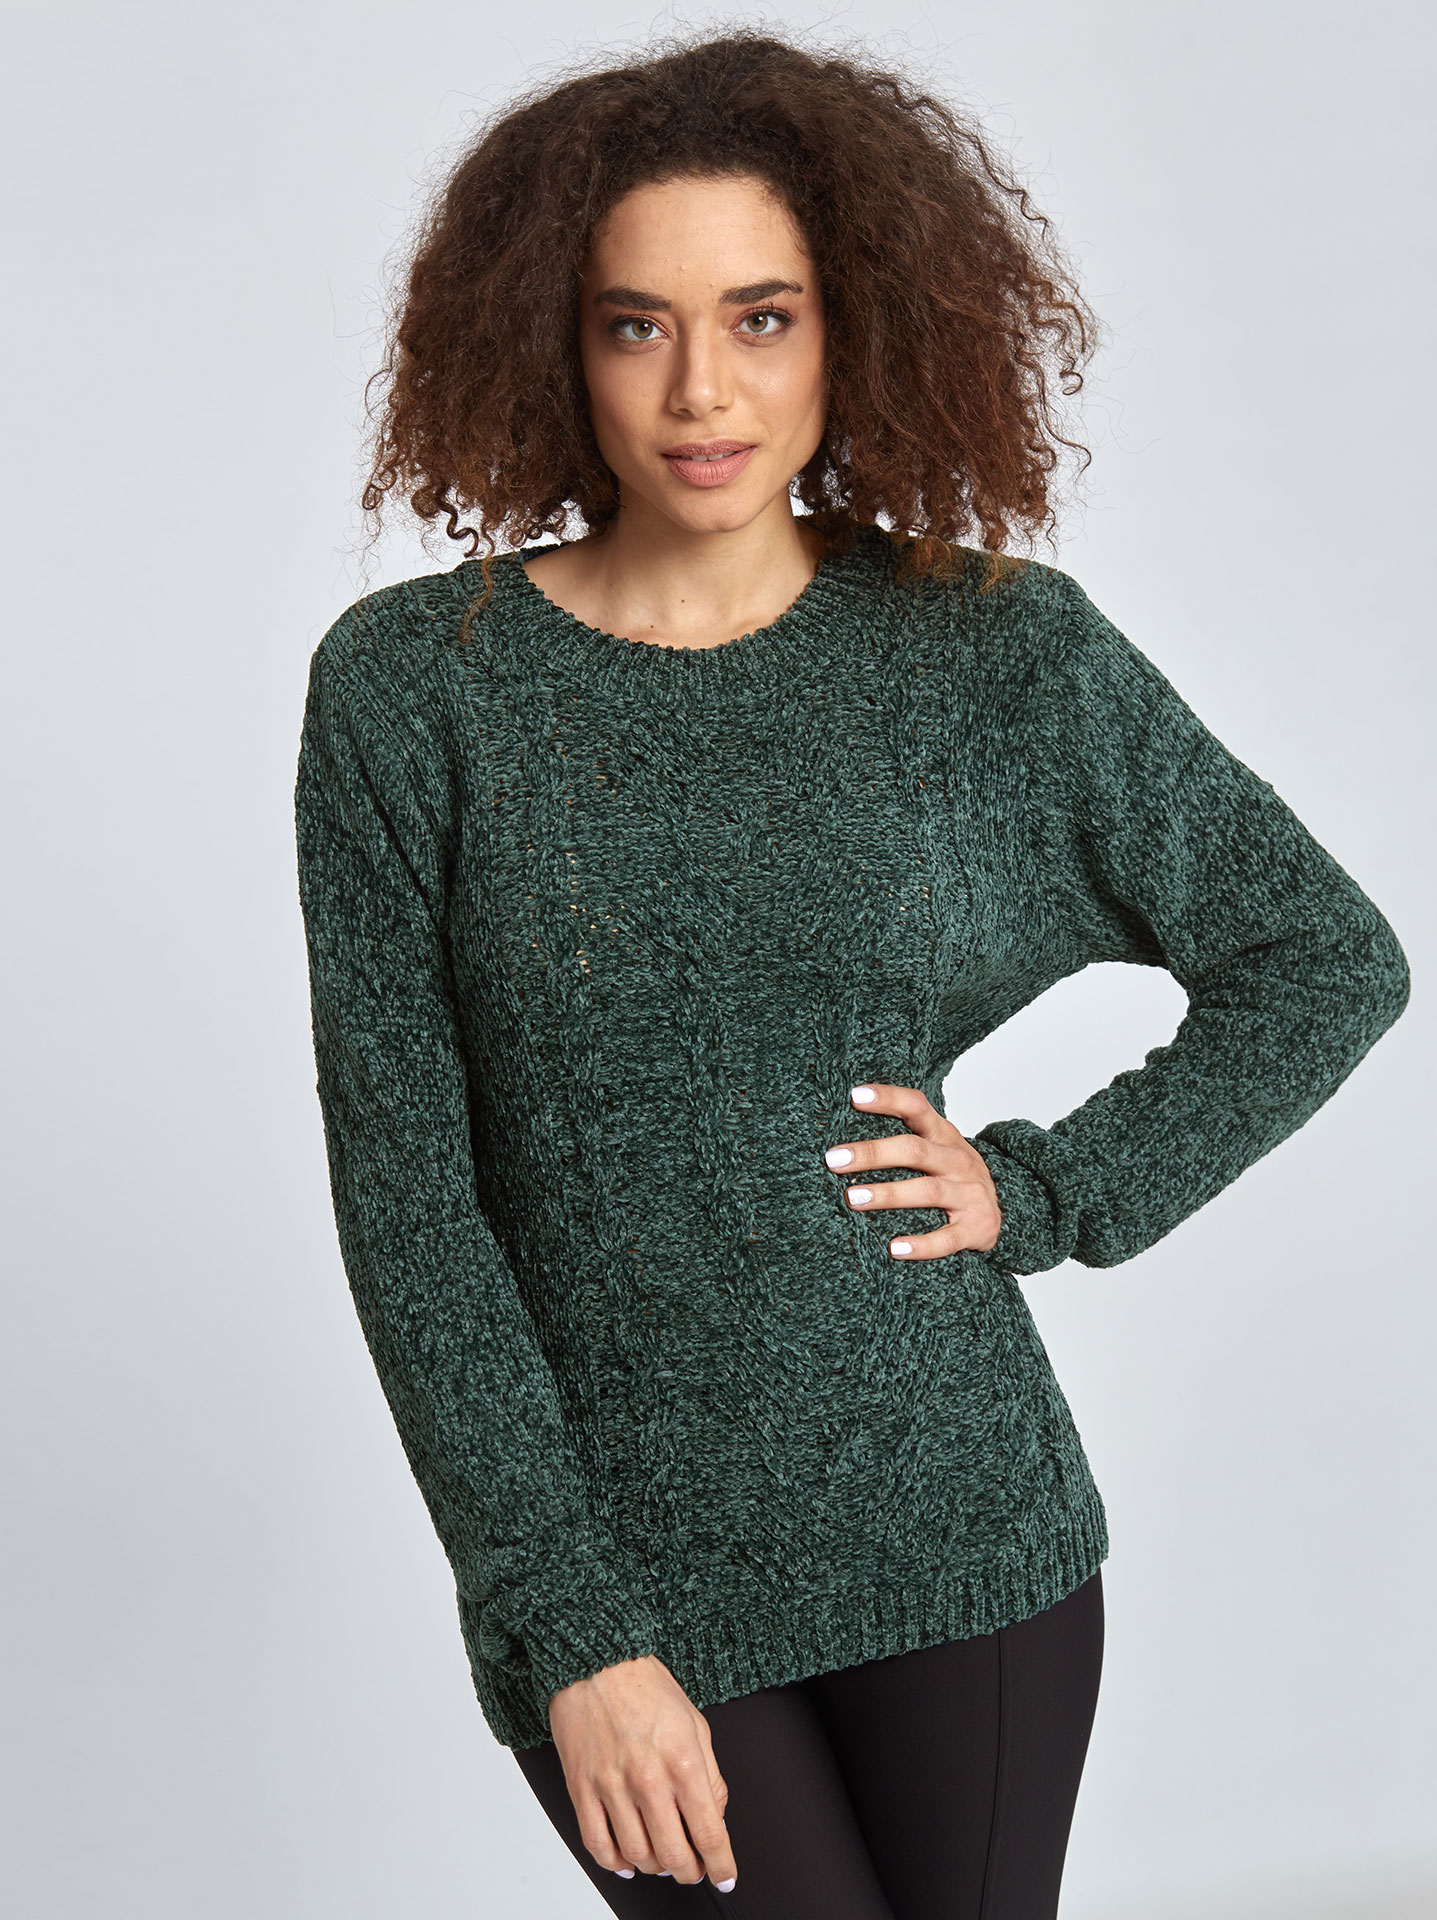 d30f5c1db01f Chenille πουλόβερ με σχέδιο σε πρασινο